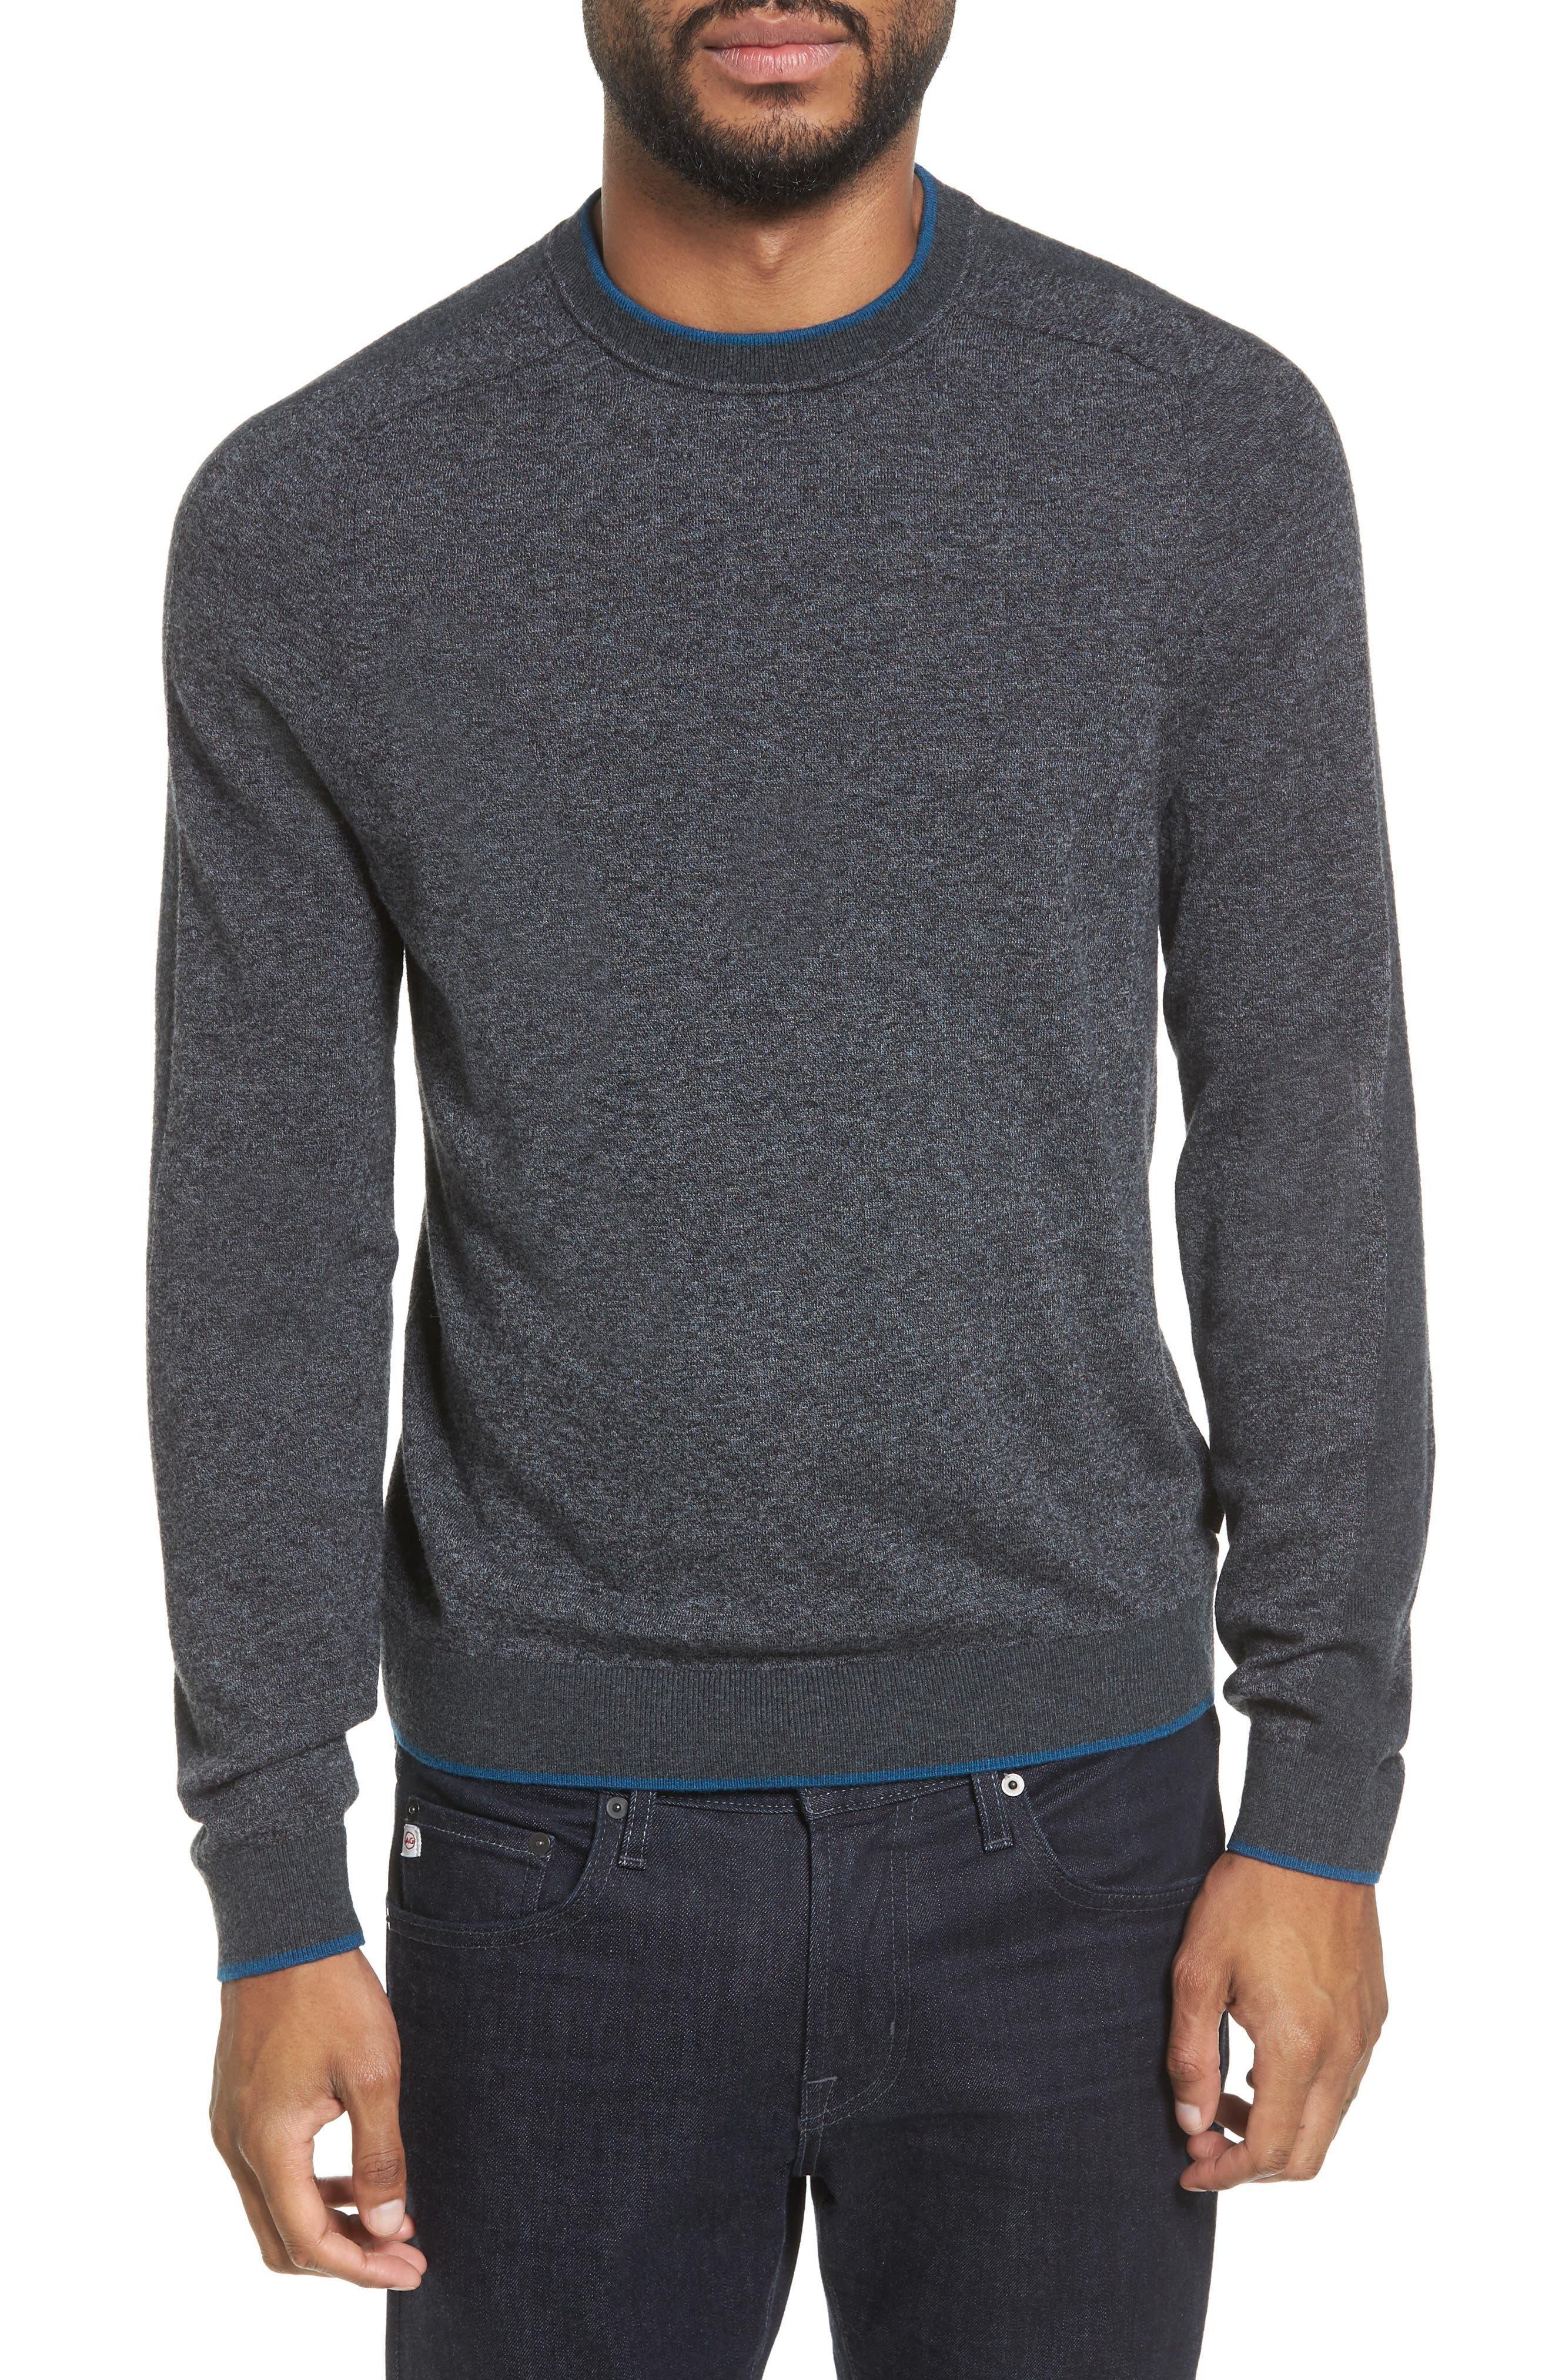 Norpol Crewneck Sweater,                         Main,                         color, 010